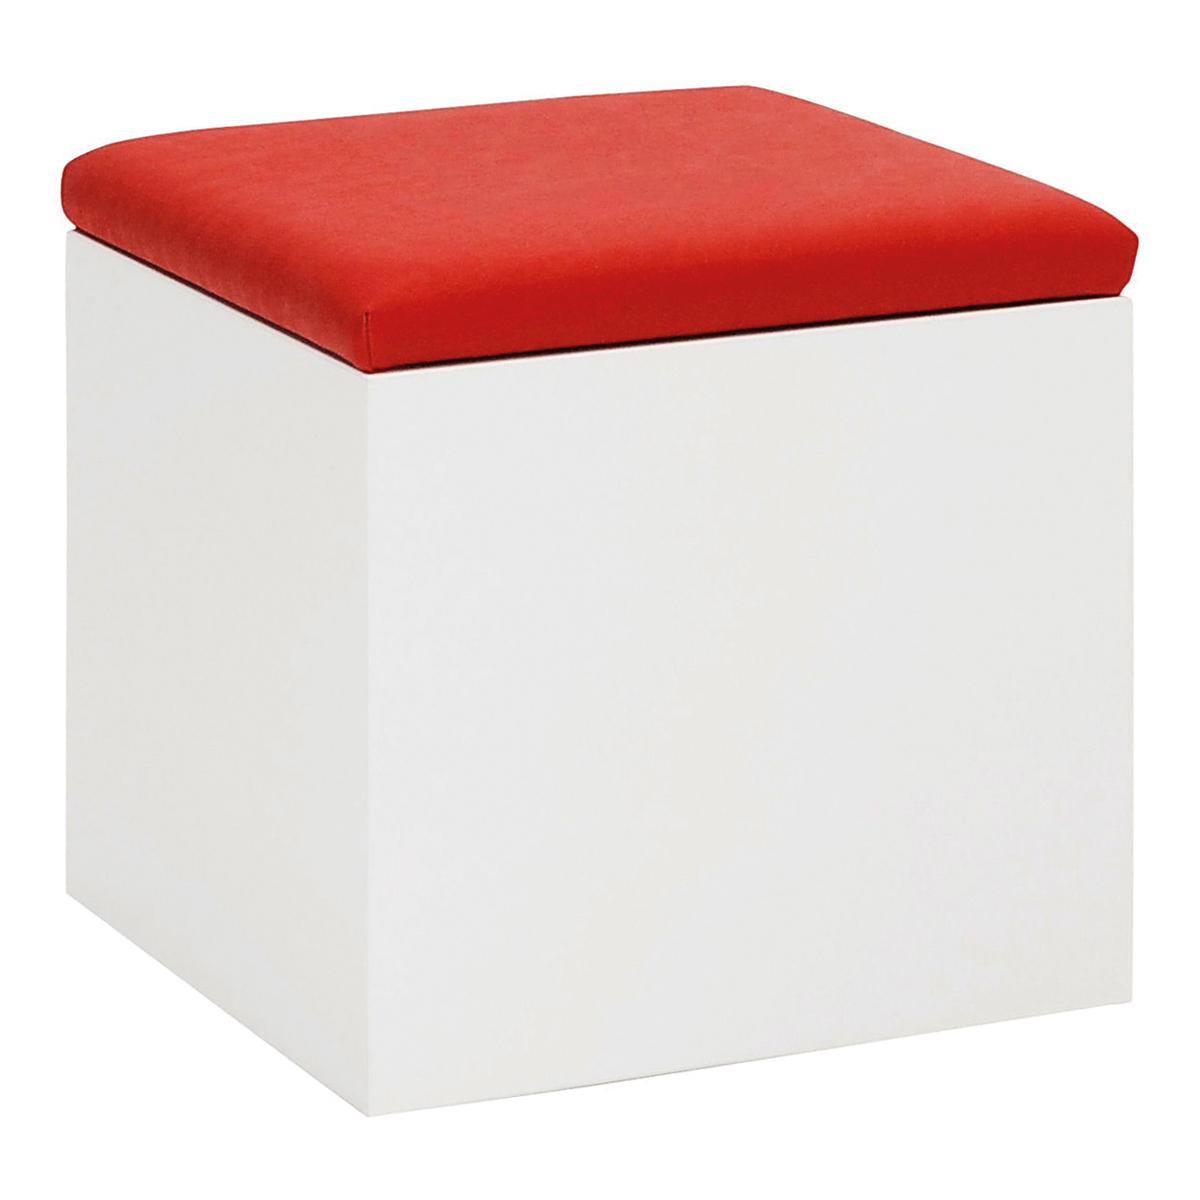 Hocker Cubus, weiß-rot